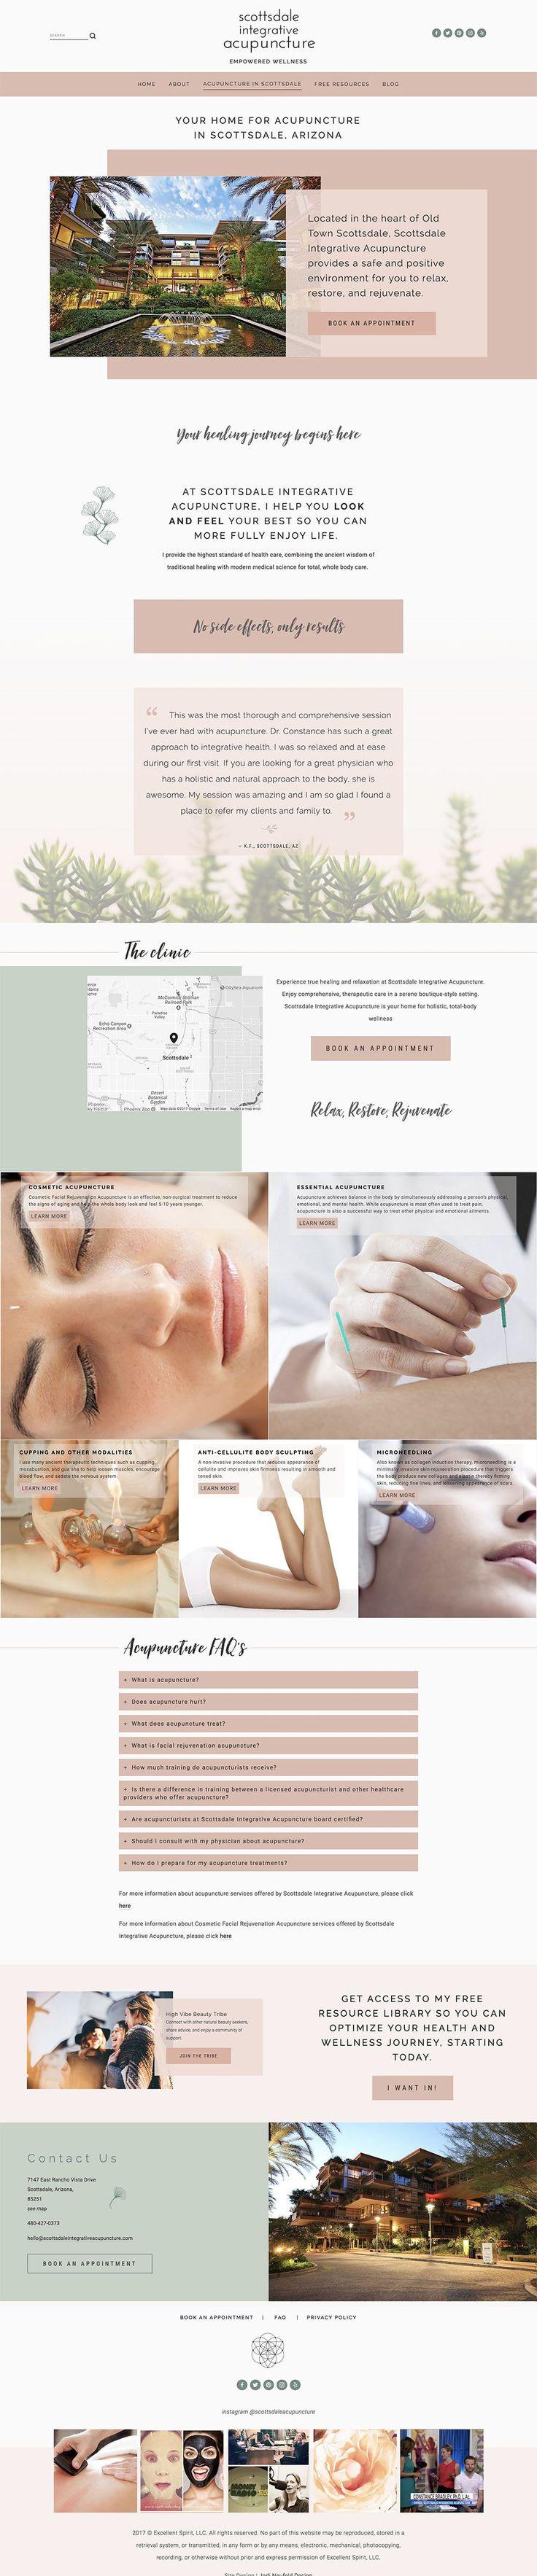 Scottsdale Integrative Acupuncture Website Redesign Web Design Webdesign Design